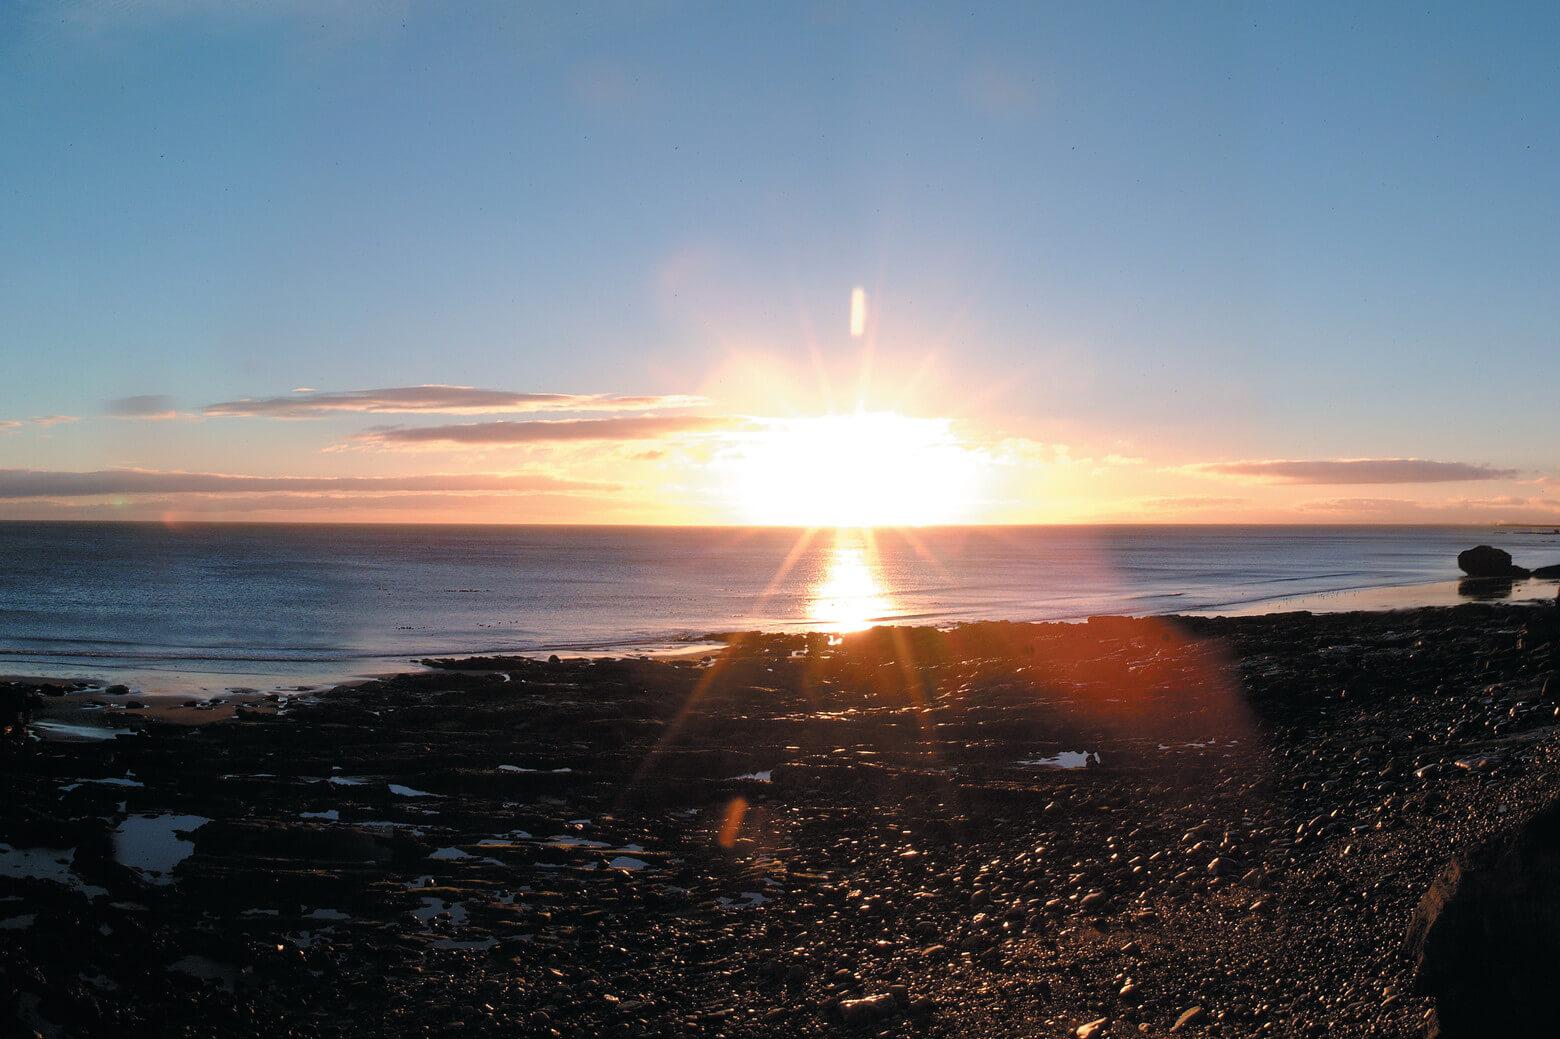 A sunrise in Sunderland